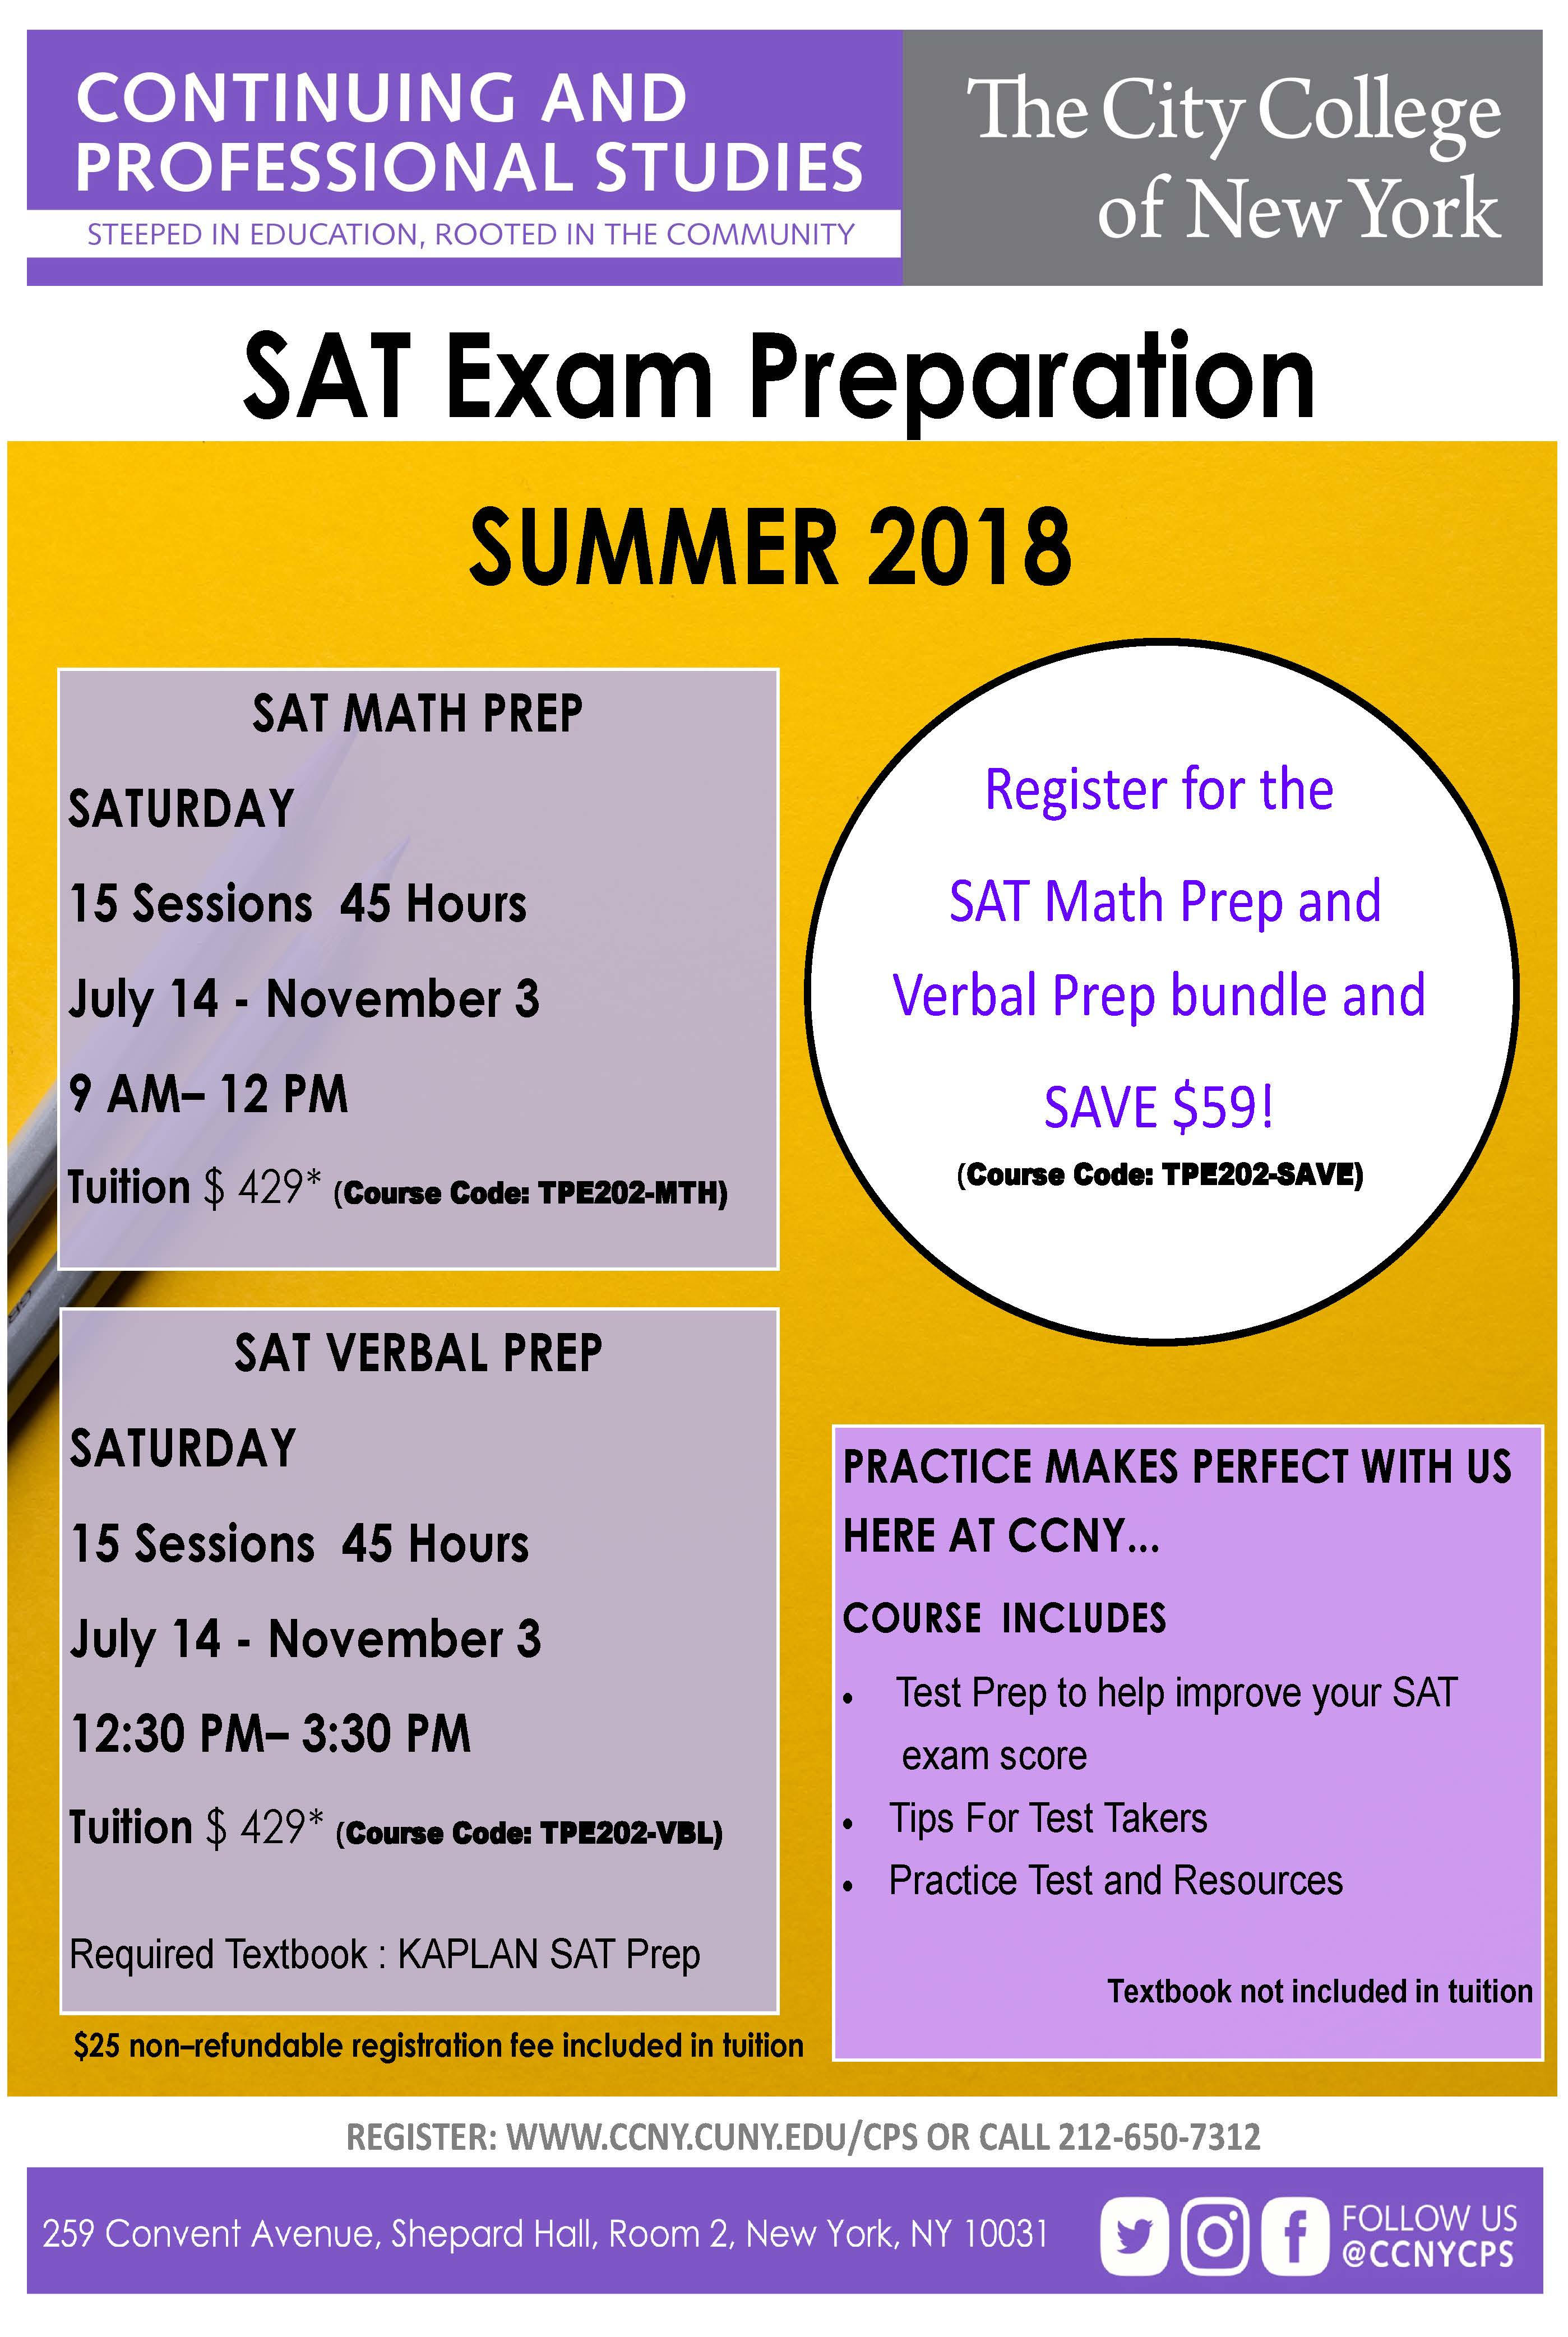 SAT Exam Prep | The City College of New York